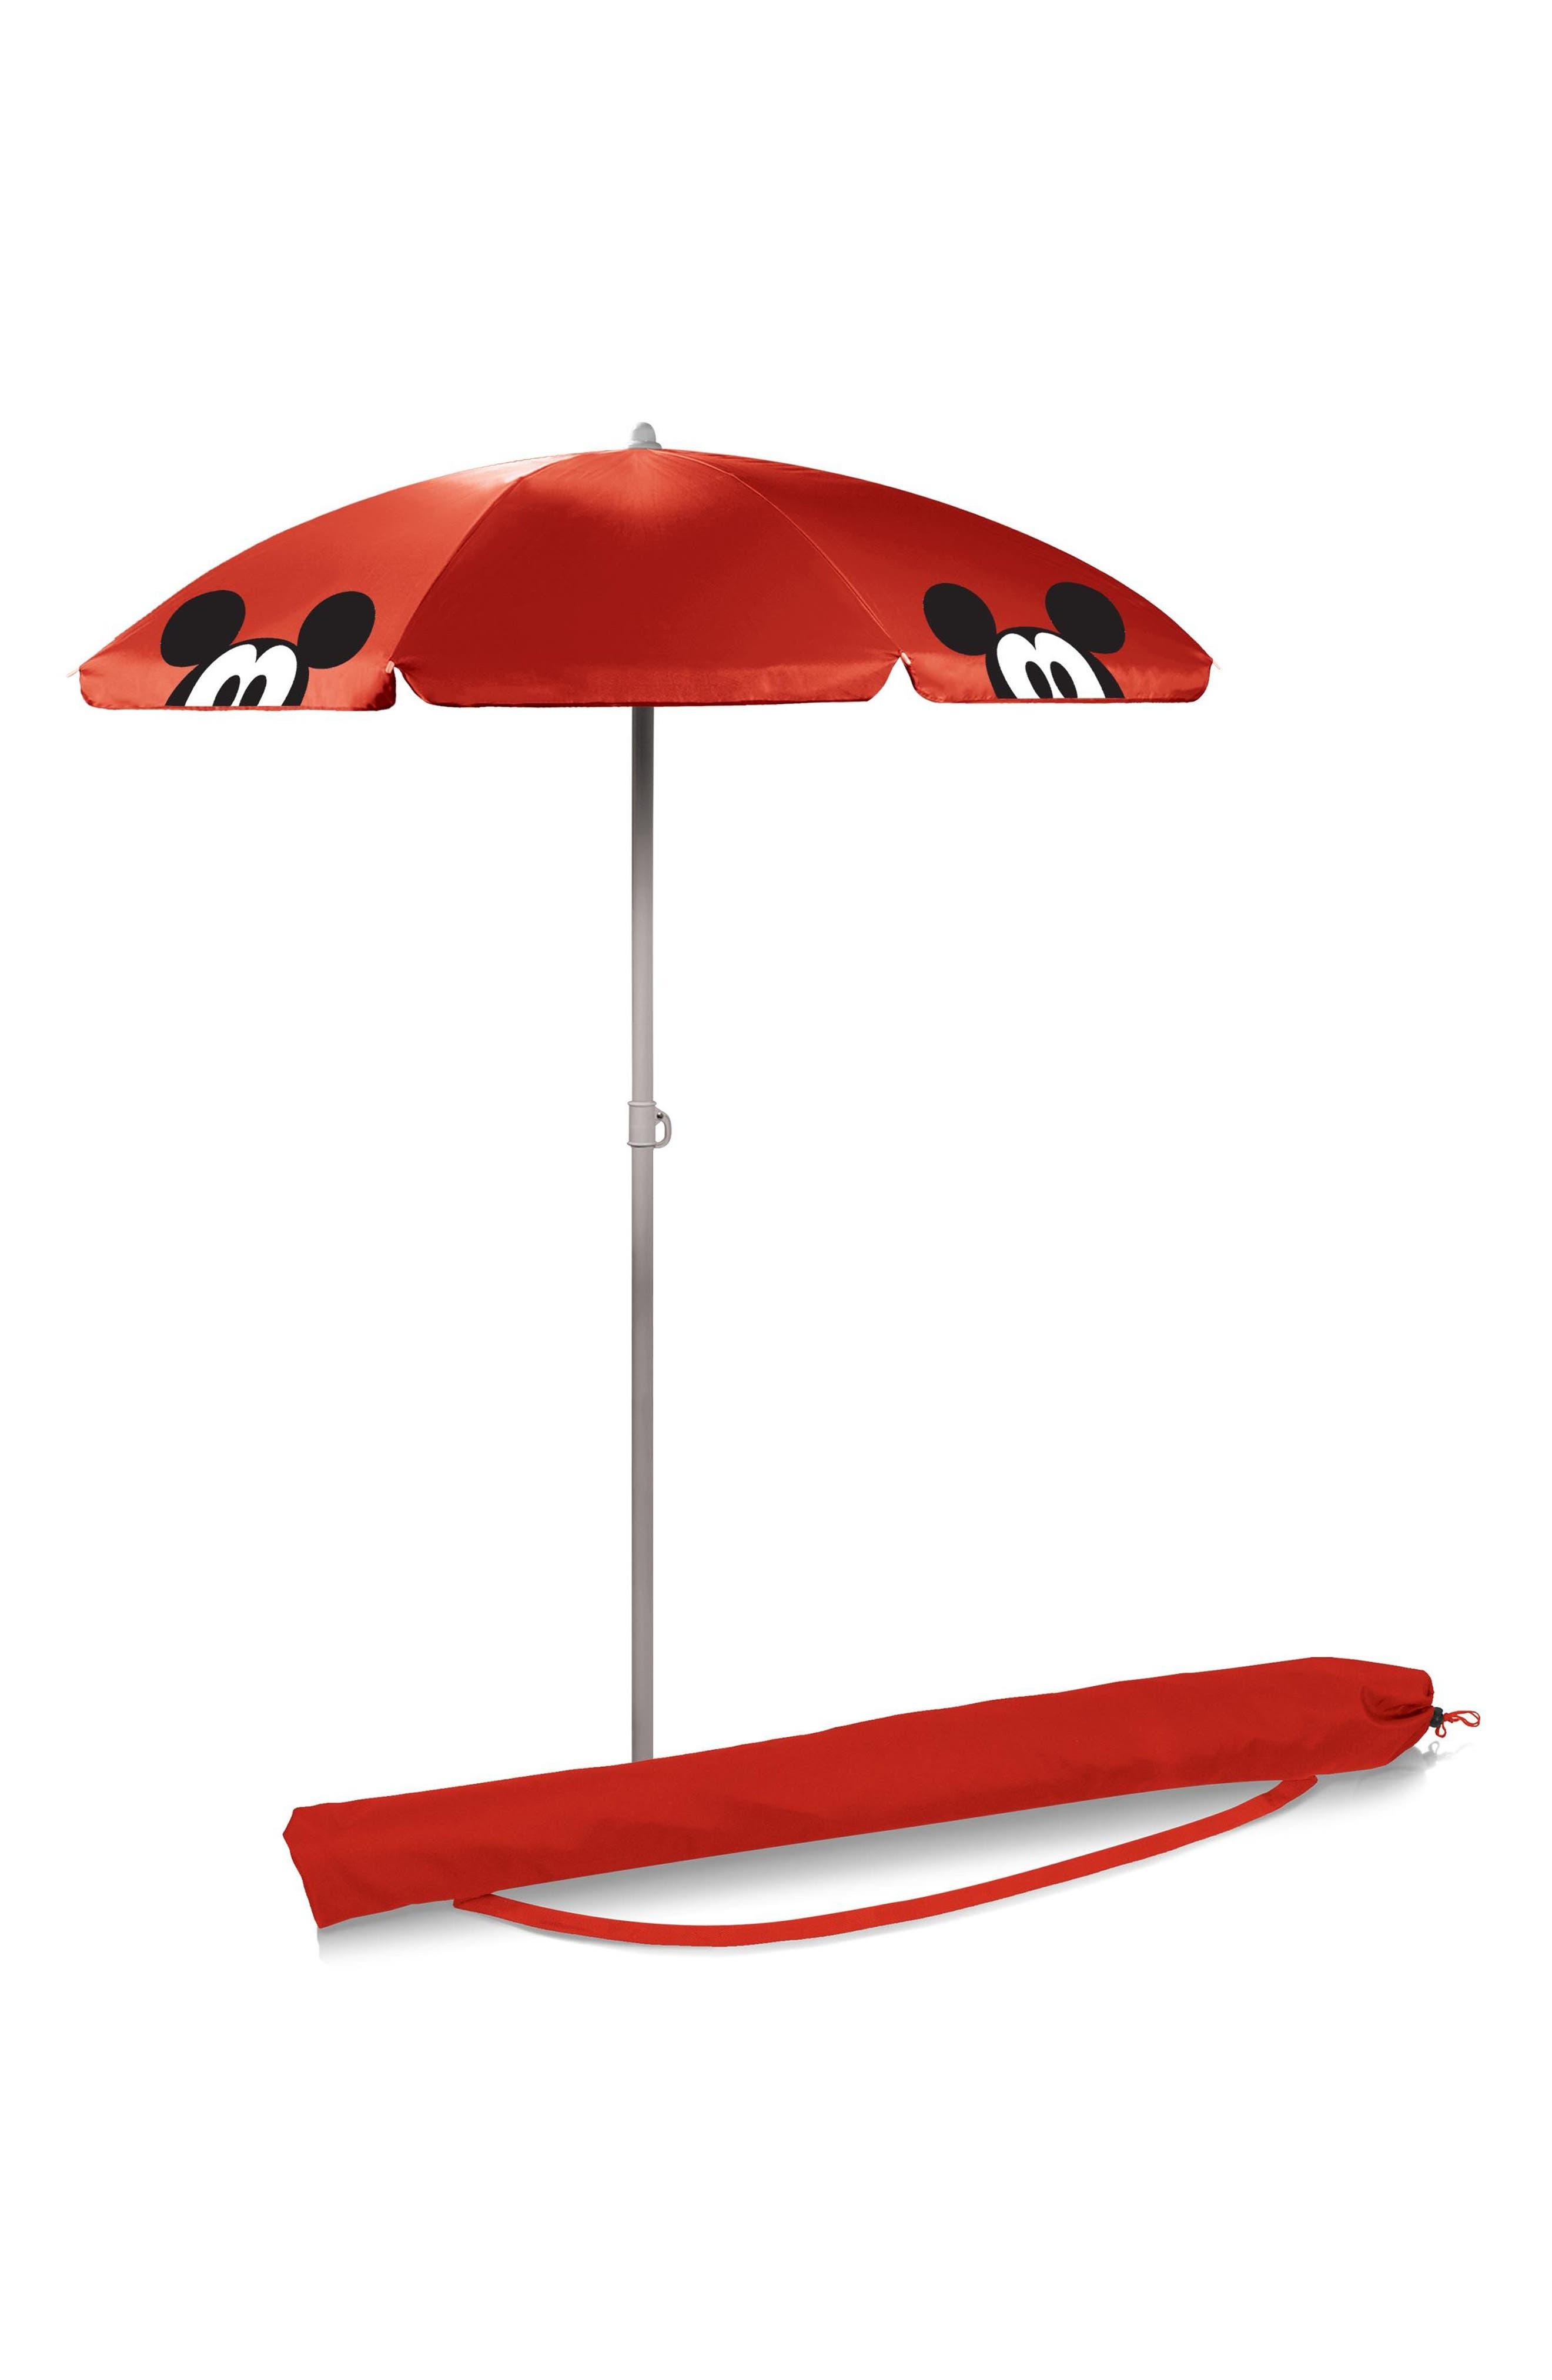 Disney<sup>®</sup> Mickey Mouse Portable Beach & Picnic Umbrella,                             Alternate thumbnail 2, color,                             Mickey